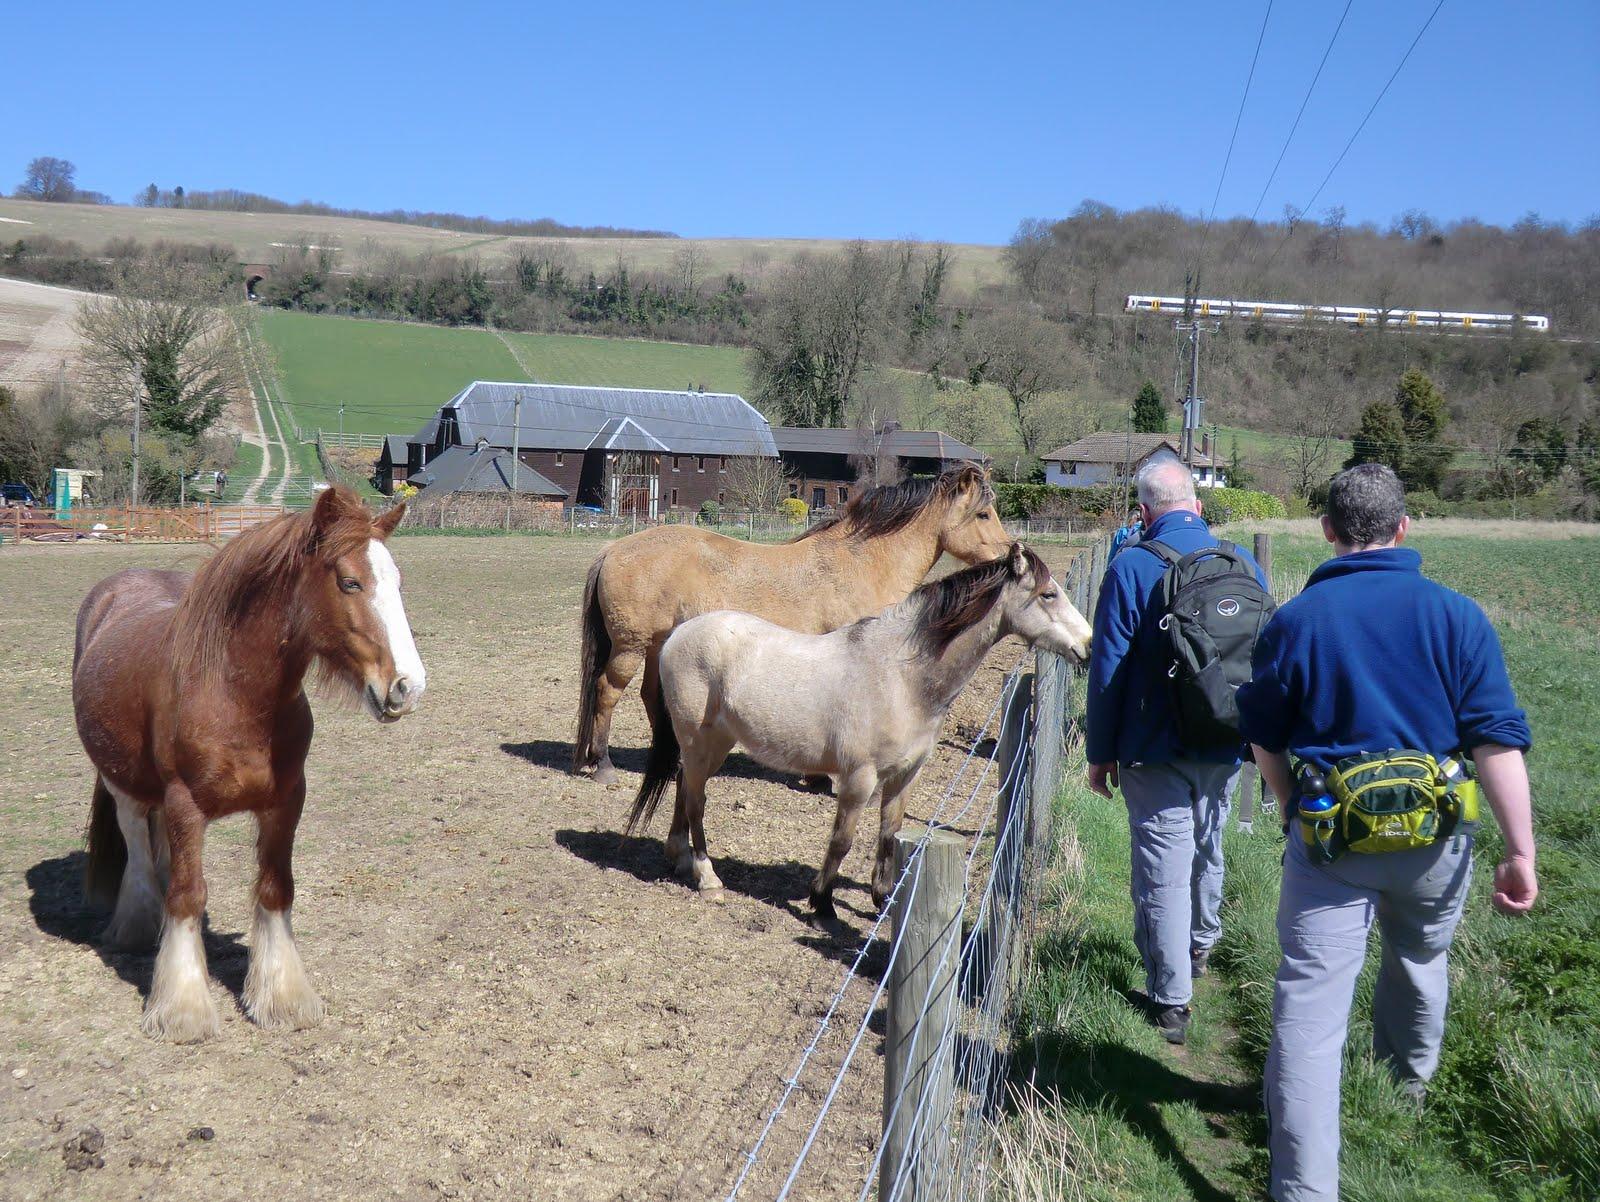 CIMG6277 Friendly horses at Lower Bush